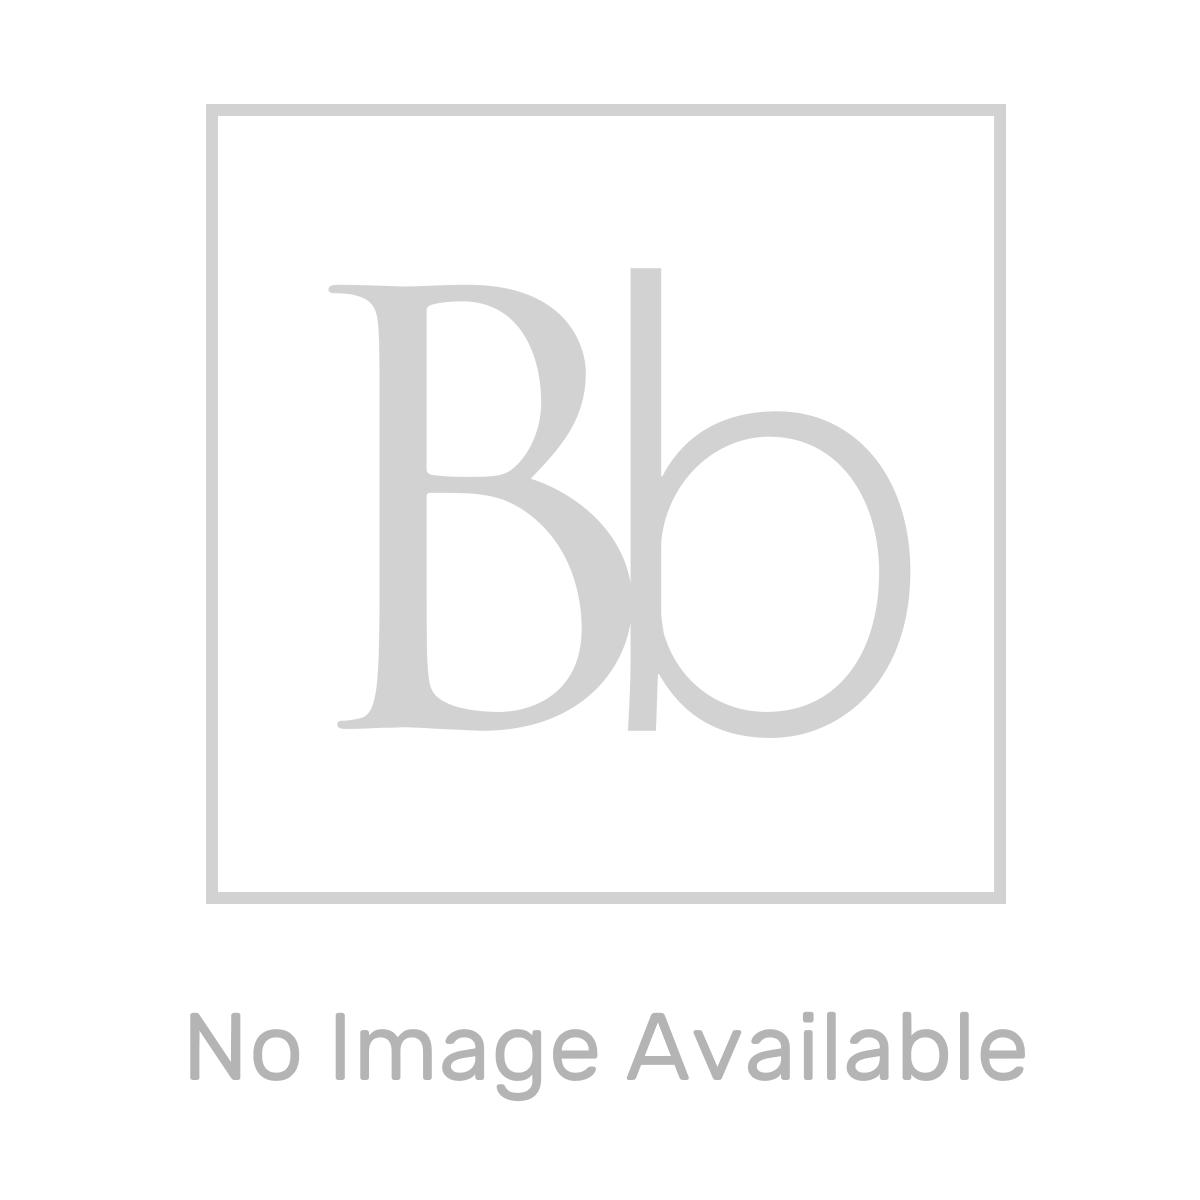 Frontline Aquaglass Onyx Black Sliding Shower Enclosure Outside Corner